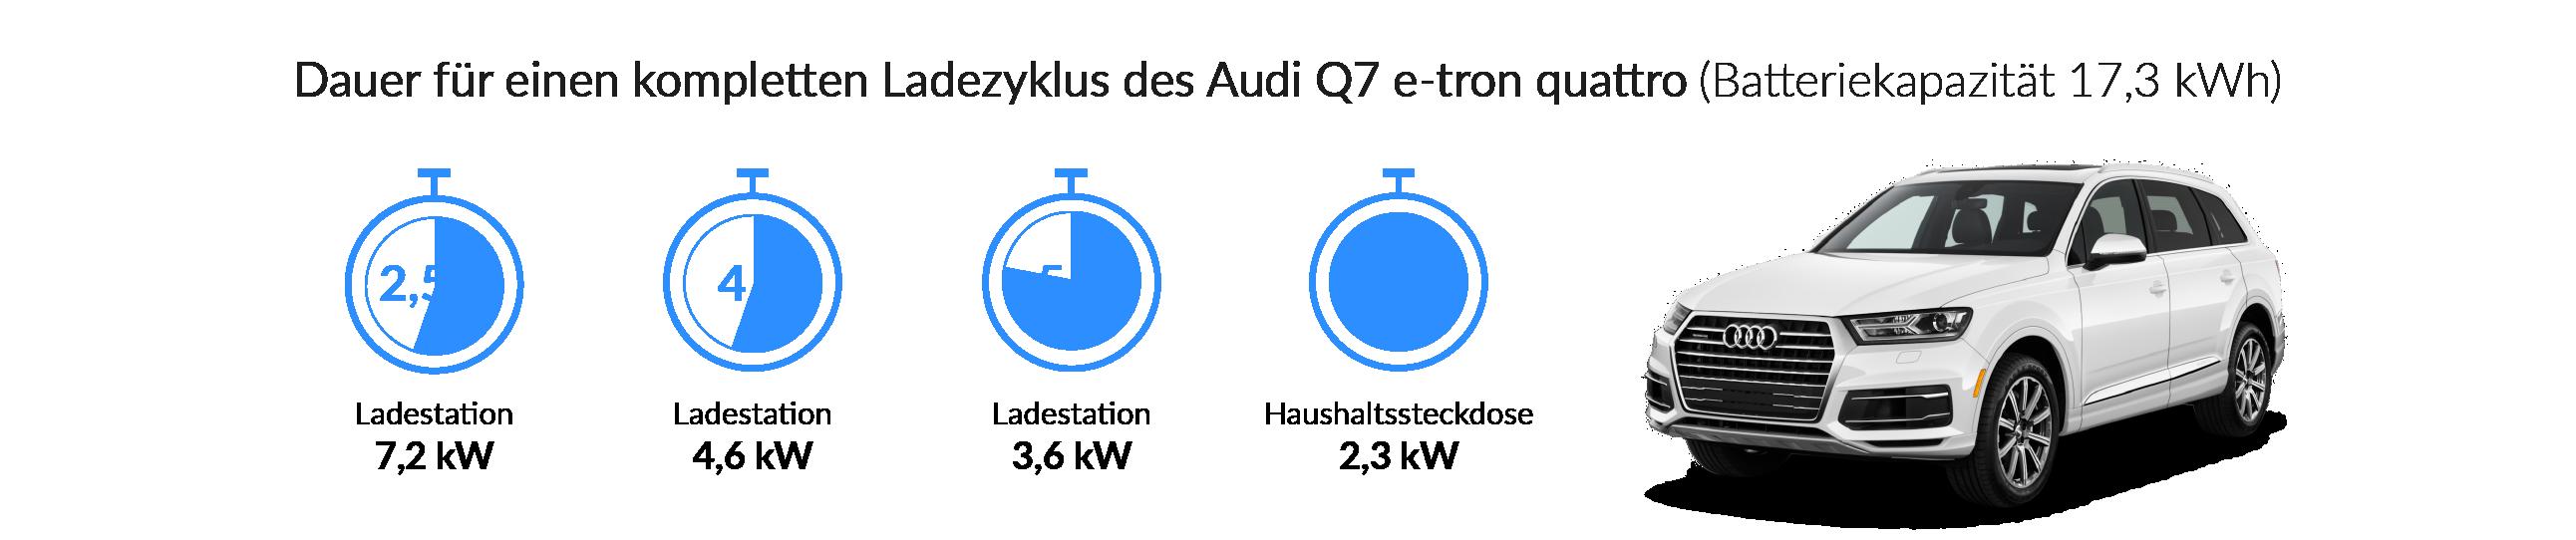 Ladezeiten des Audi Q7 e-tron quattro